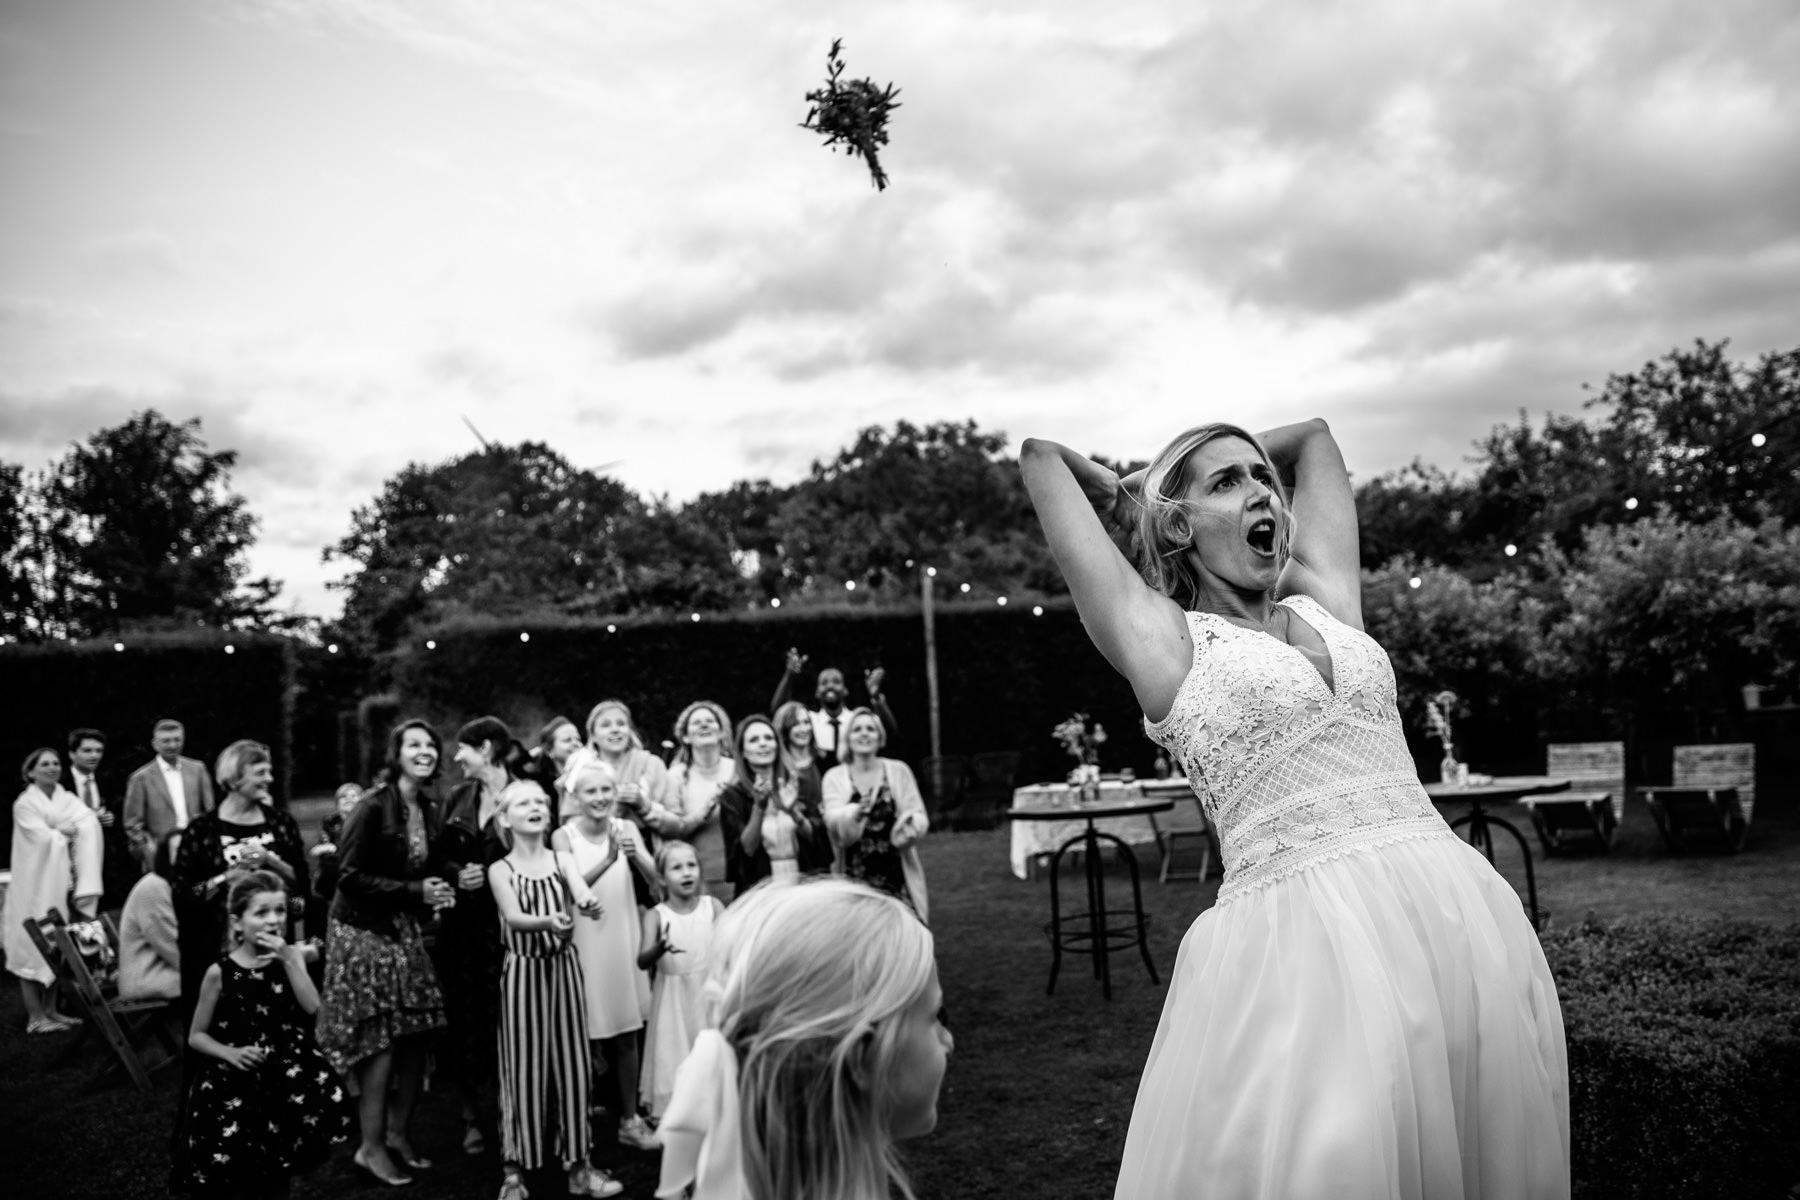 Grappige trouwfoto | originele trouwfoto | Mooiste trouwfoto